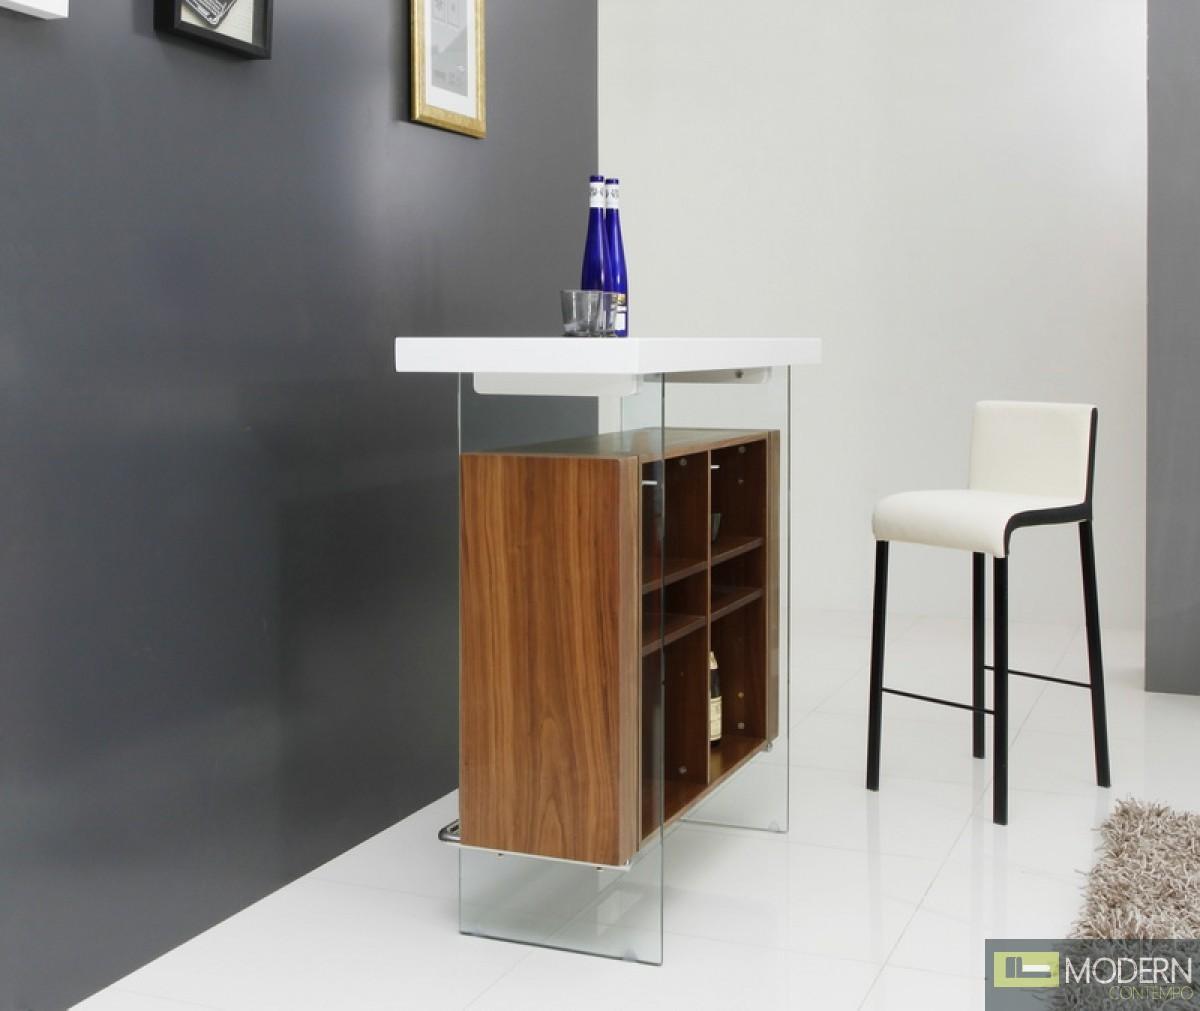 Woodbury Contemporary White & Walnut Bar table